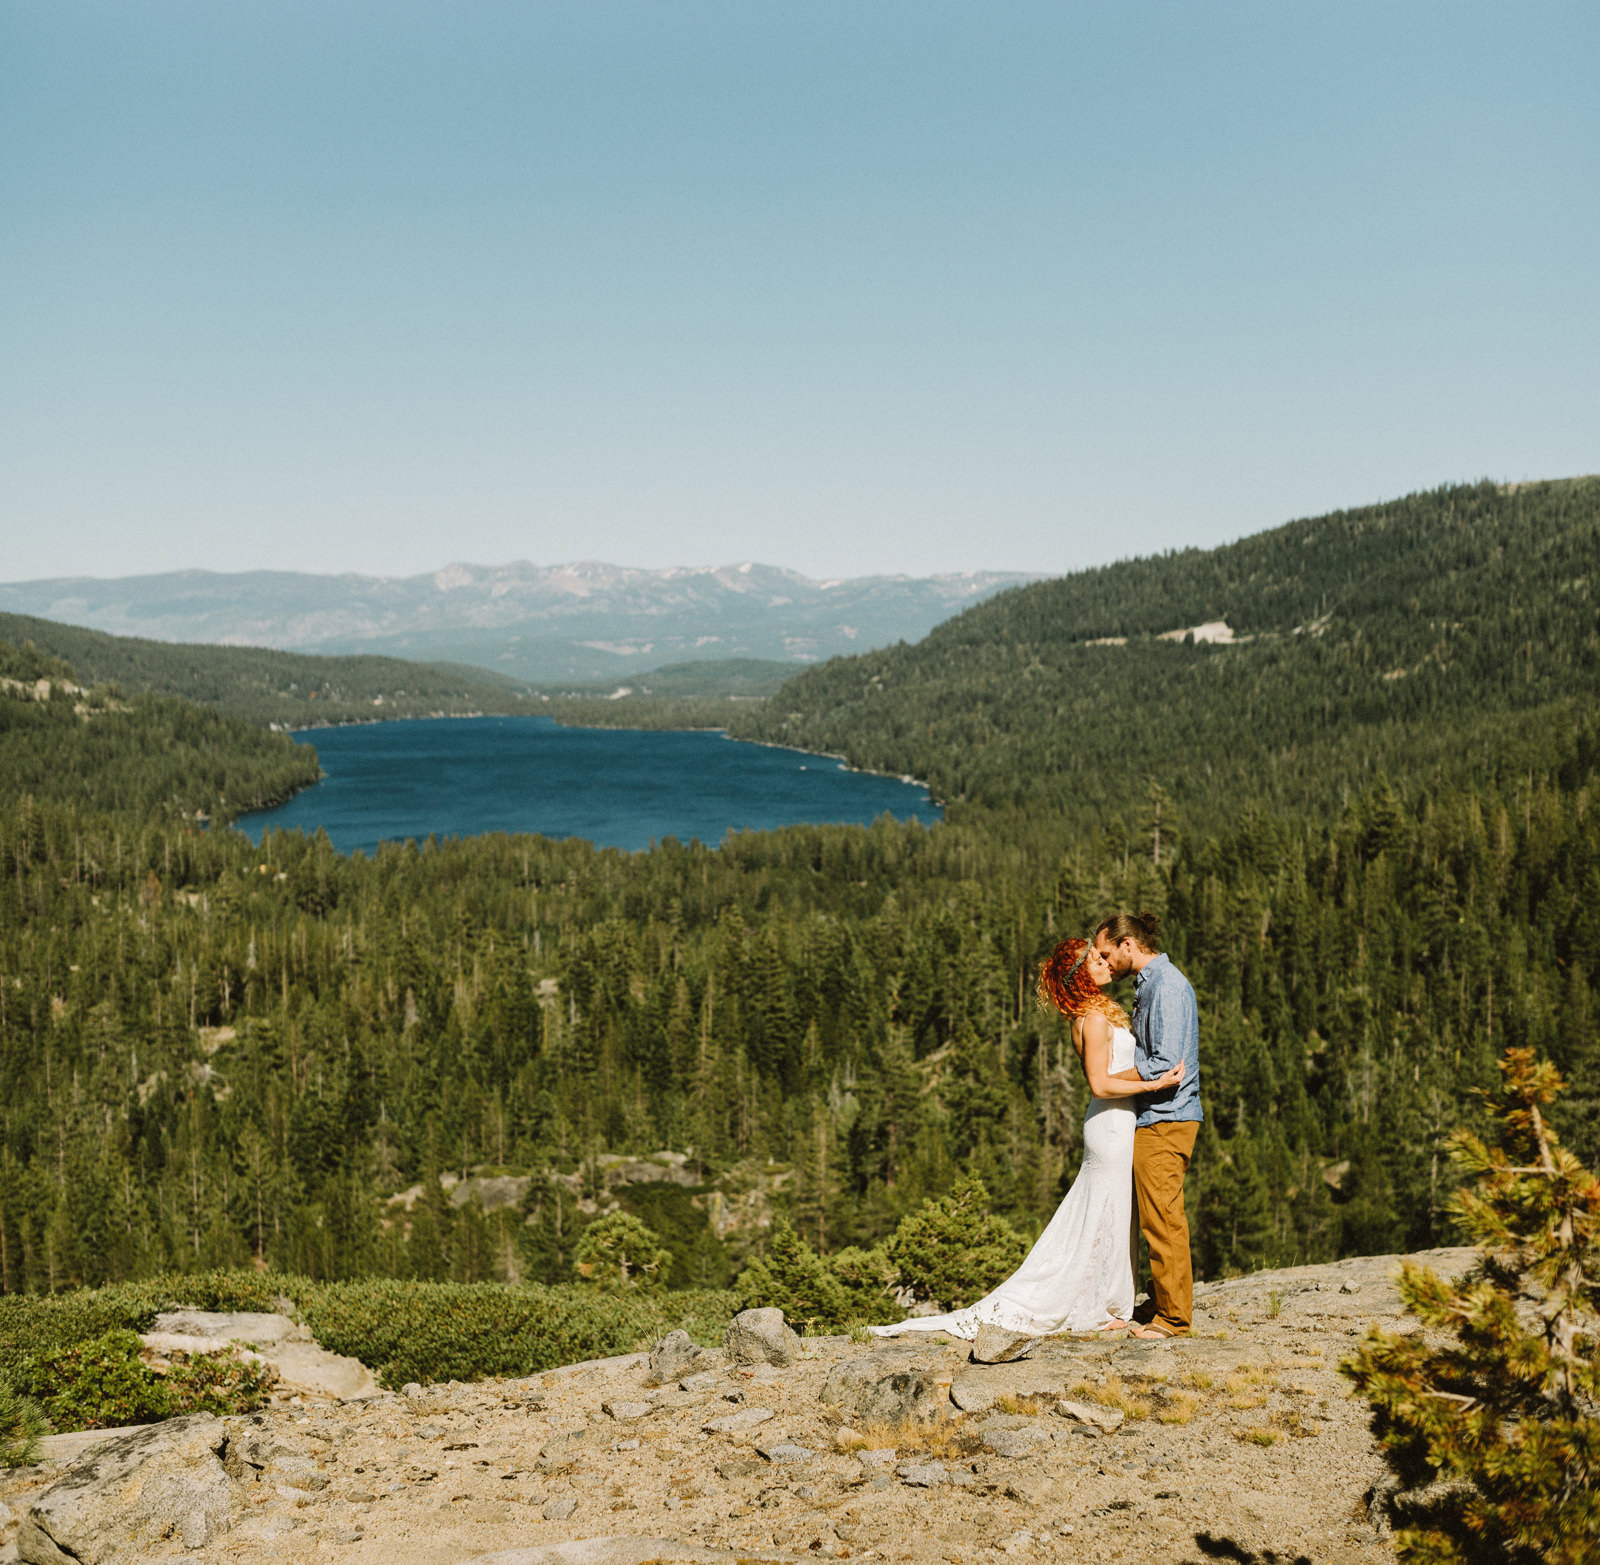 lake-tahoe-elopement-033 LAKE TAHOE ELOPEMENT